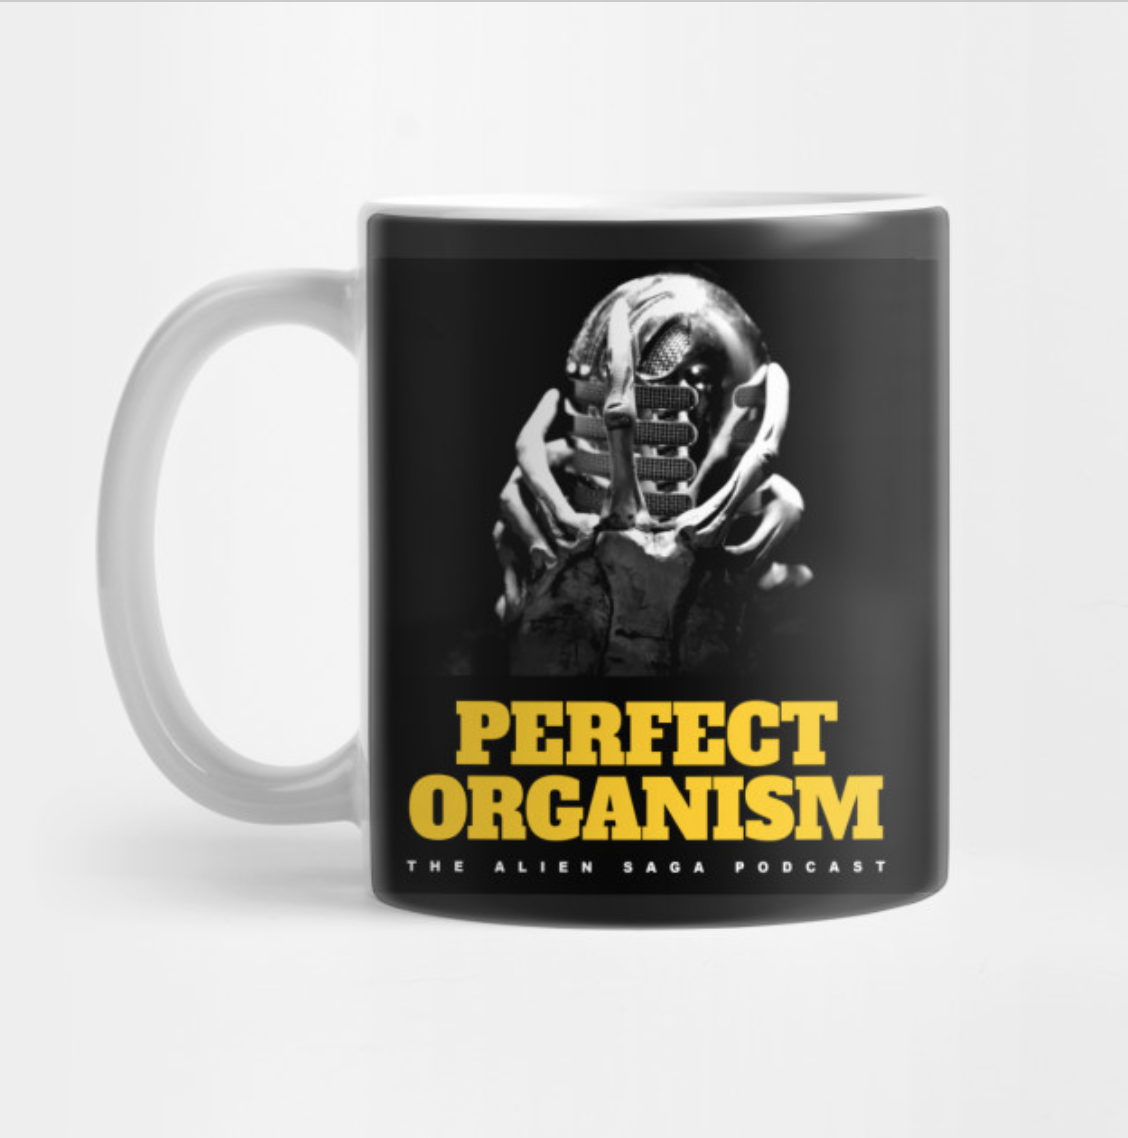 PERFECT ORGANISM MUG: $15/$12.75 Patrons